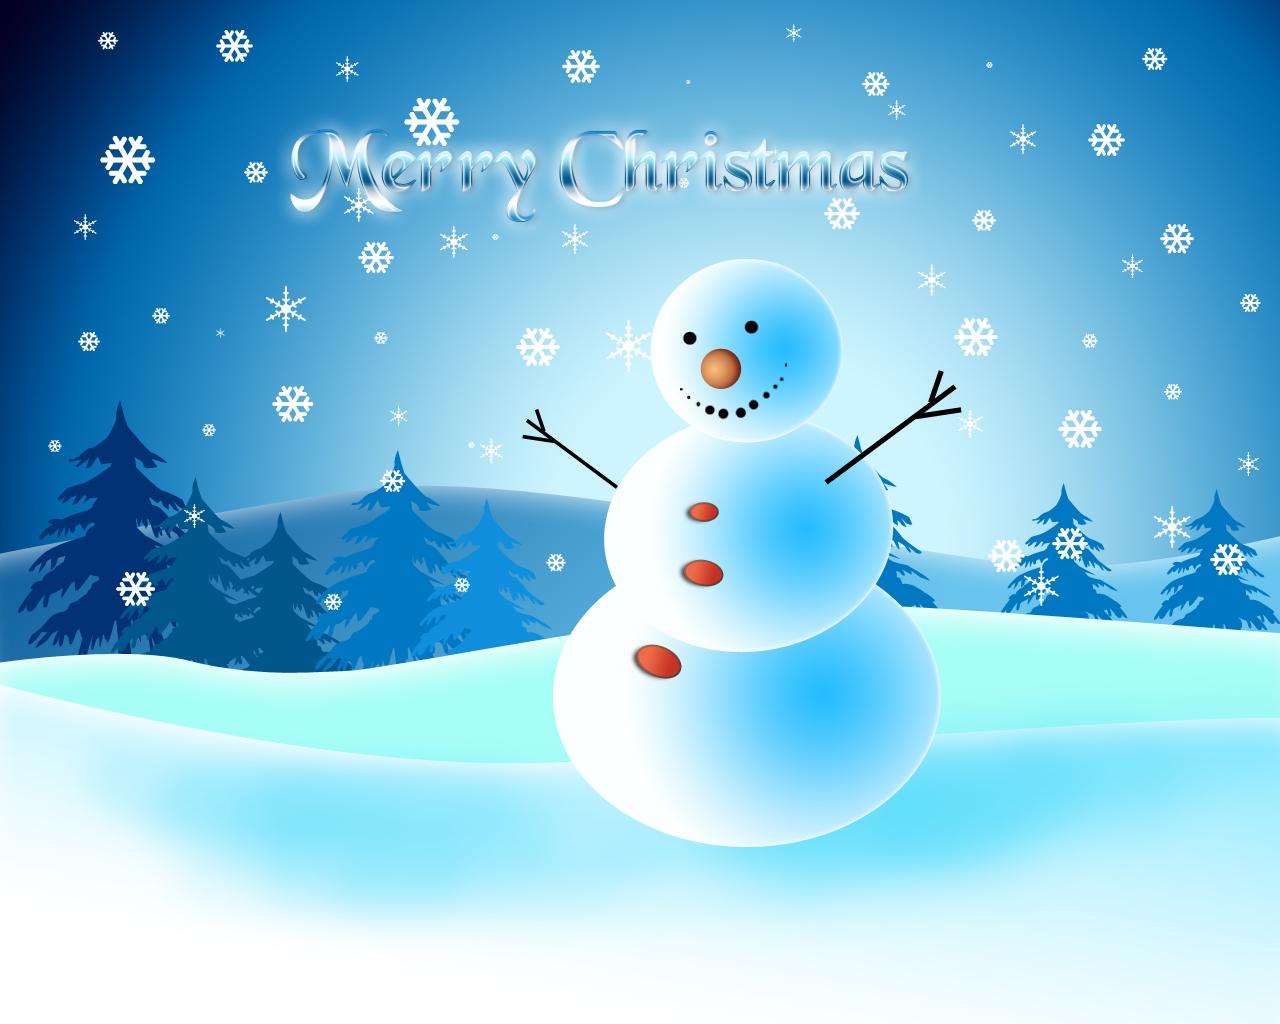 http://1.bp.blogspot.com/-asEMbfkntsU/UMLtM0NeATI/AAAAAAABAp0/o1C4D63Cdto/s1600/Merry_Christmas_Wallpaper_by_JackieW.png